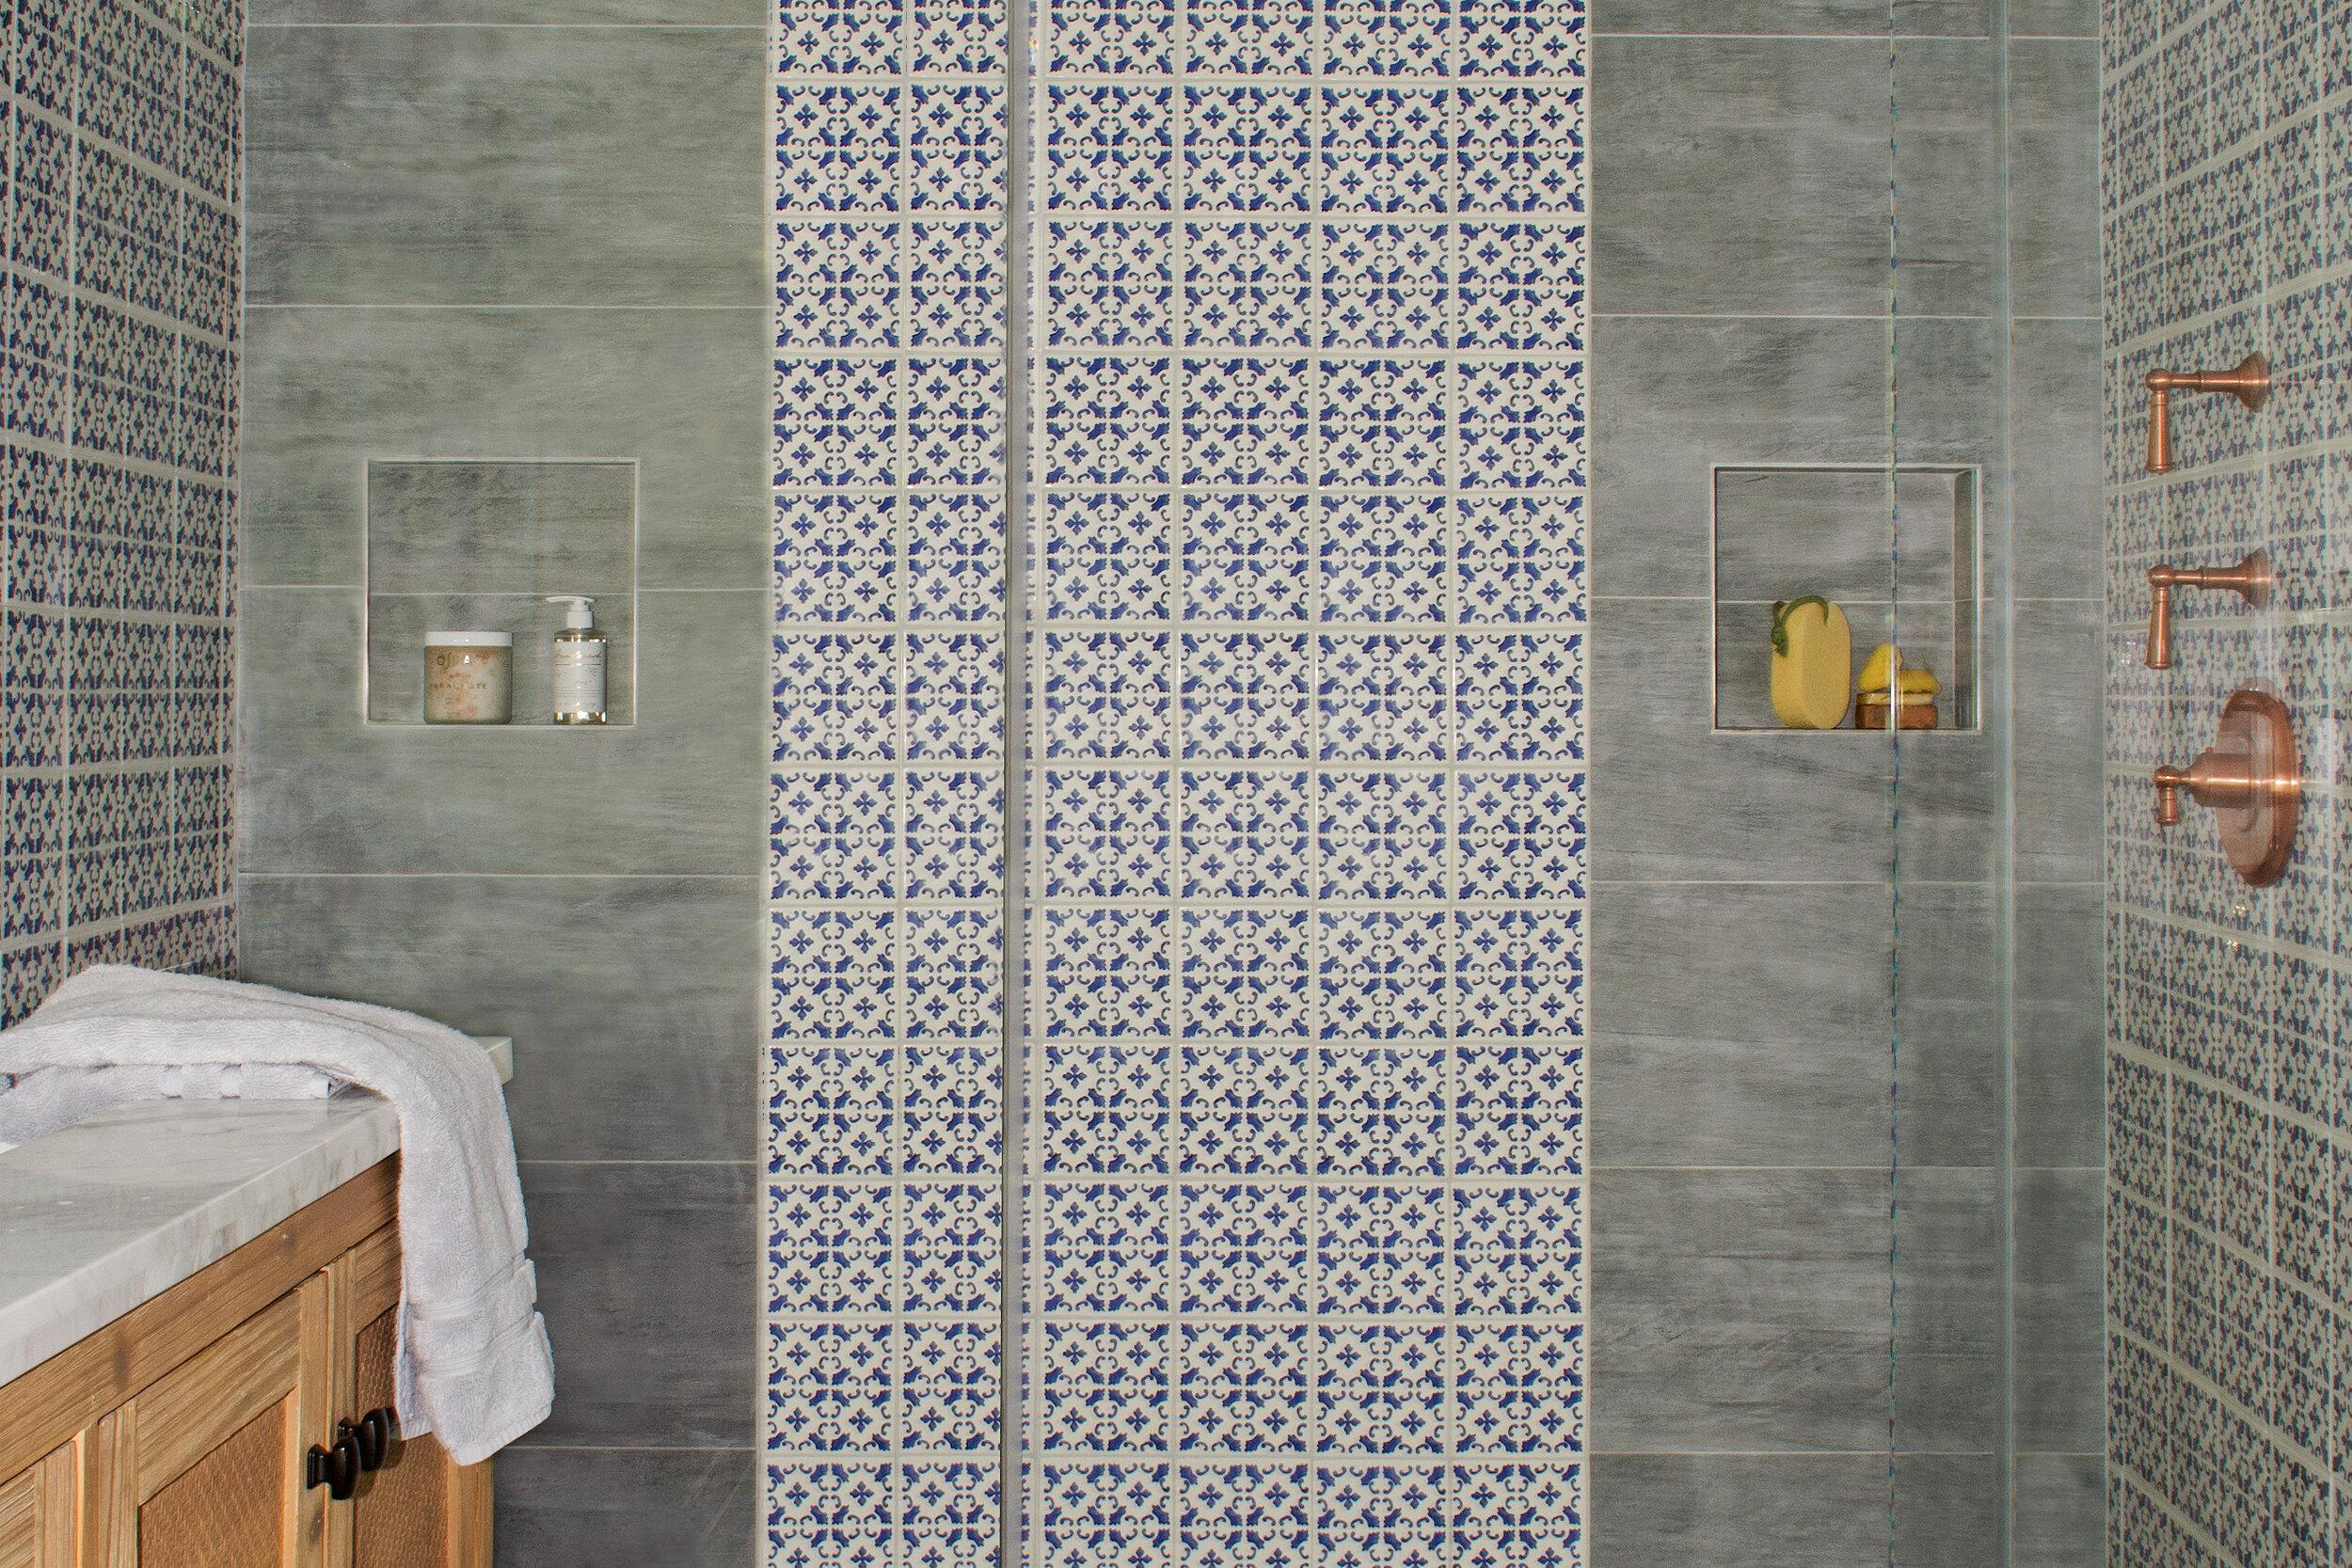 master-bathroom-eclectic-navy-tc-interiors-4.jpg